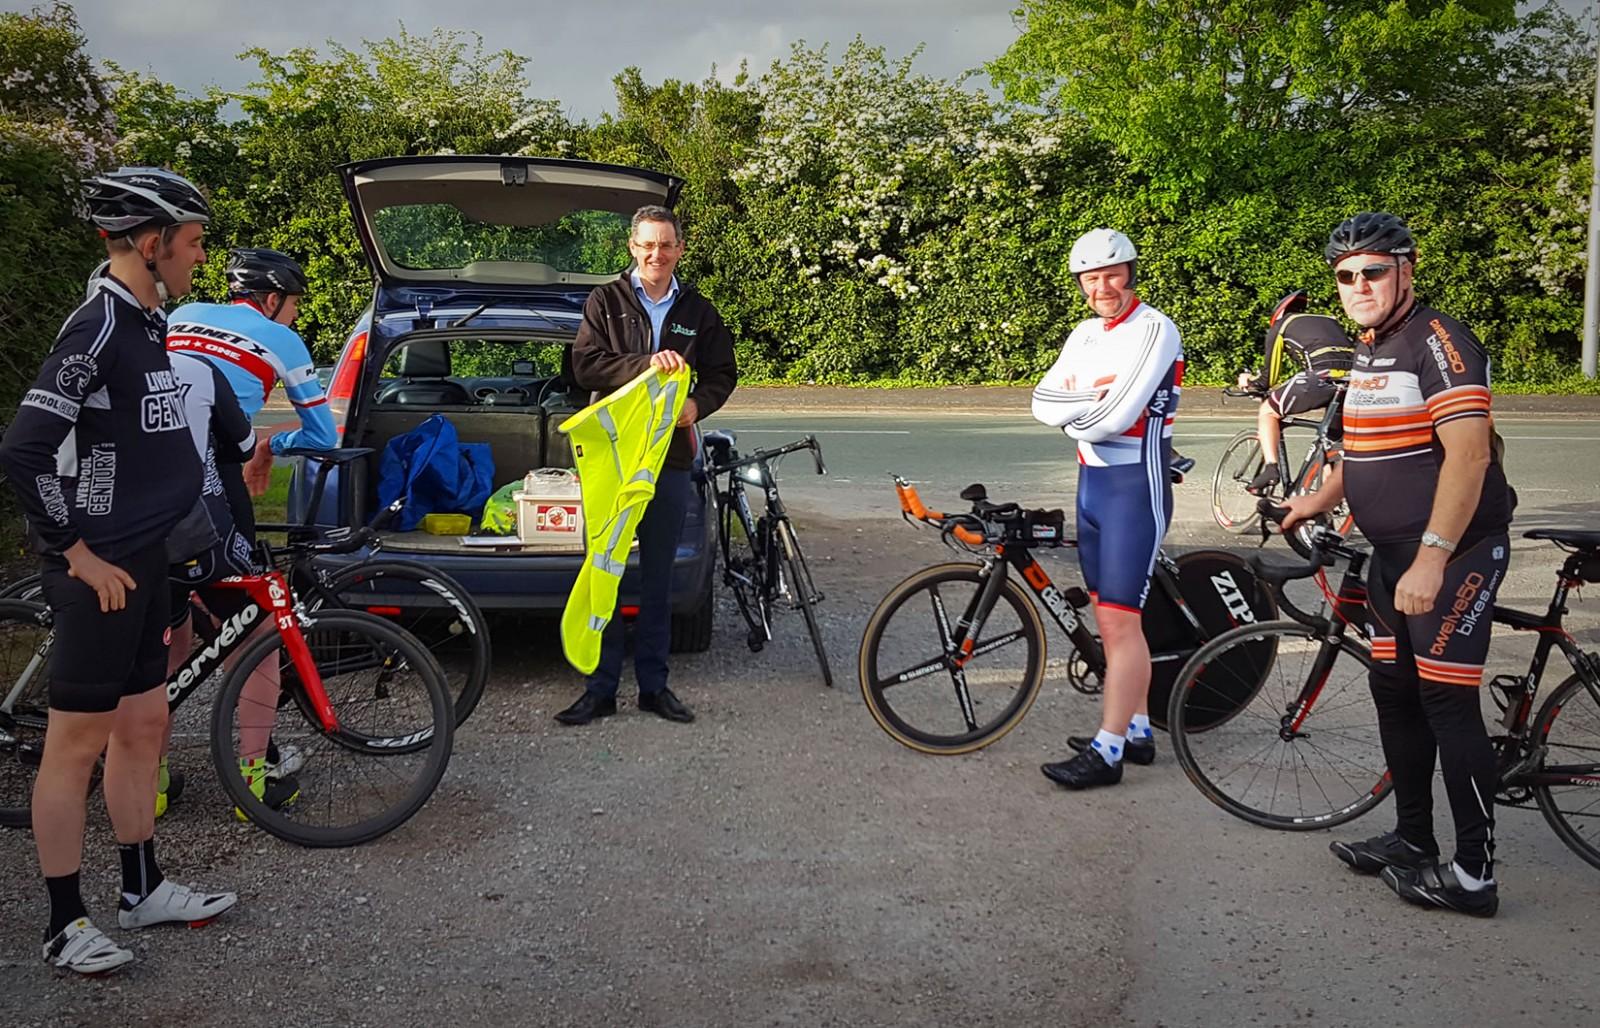 frodsham runcorn cyclists time trials riders bikes